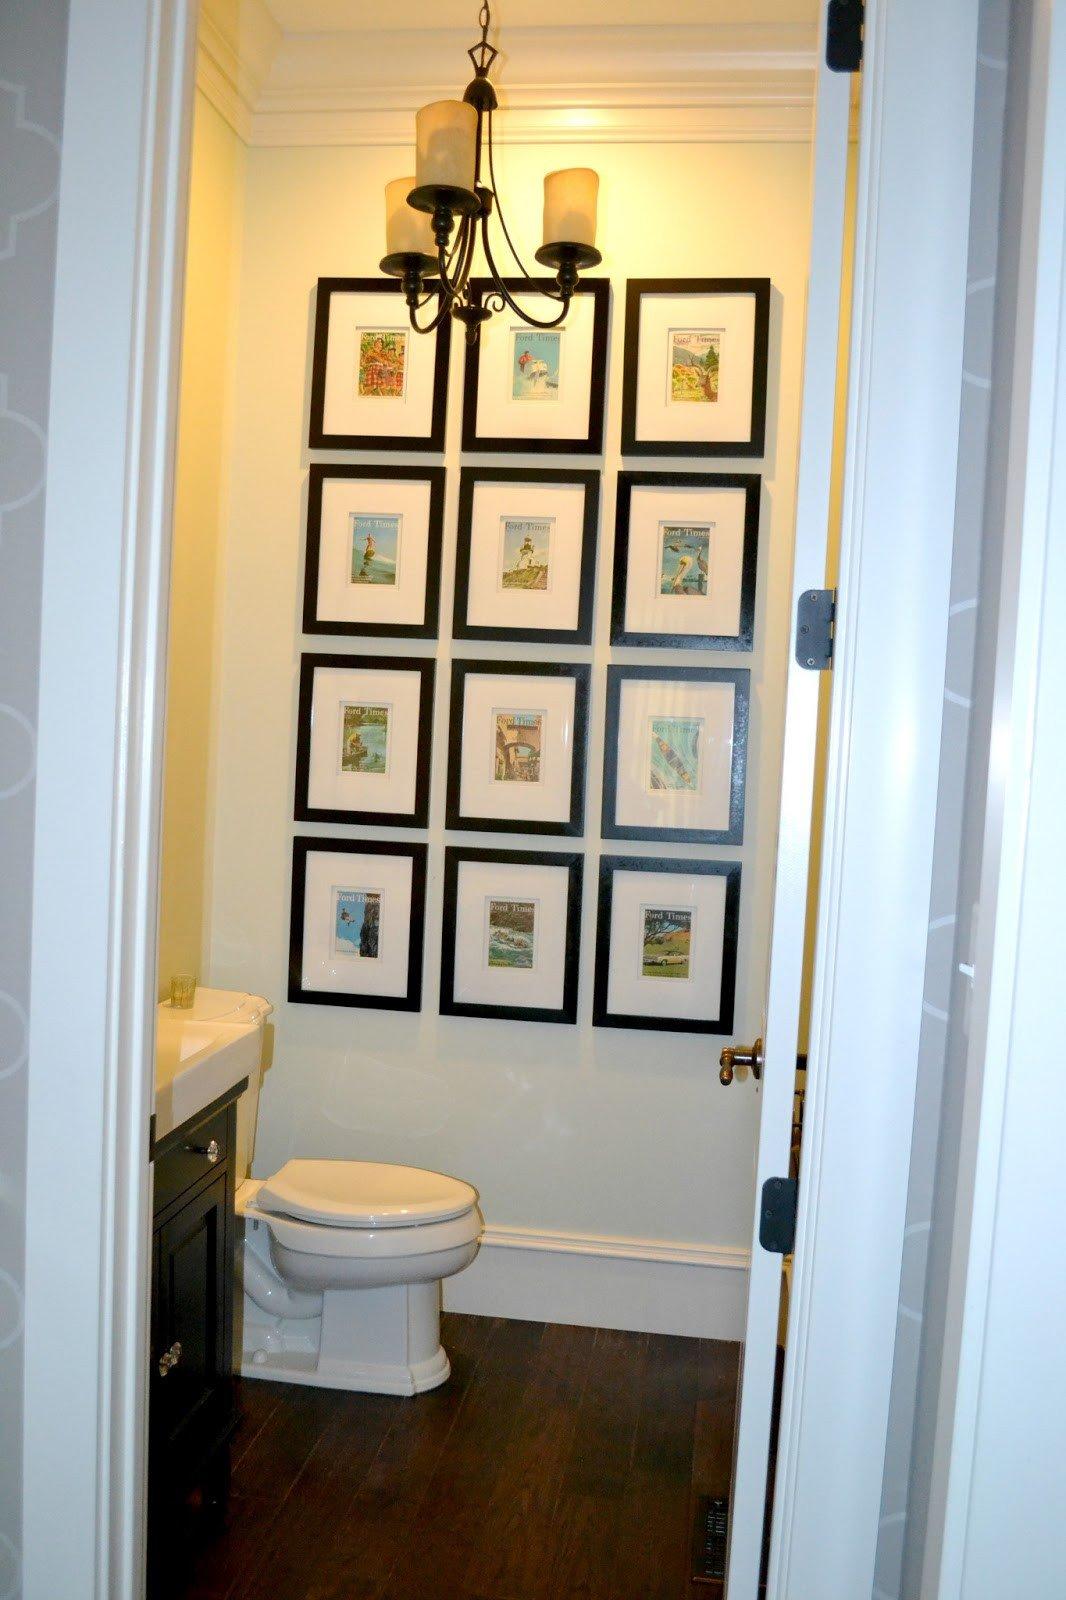 Bathroom Wall Art Ideas Decor Inspirational Decor You Adore Wall Art How to Make A Big Impact with A Small Bud